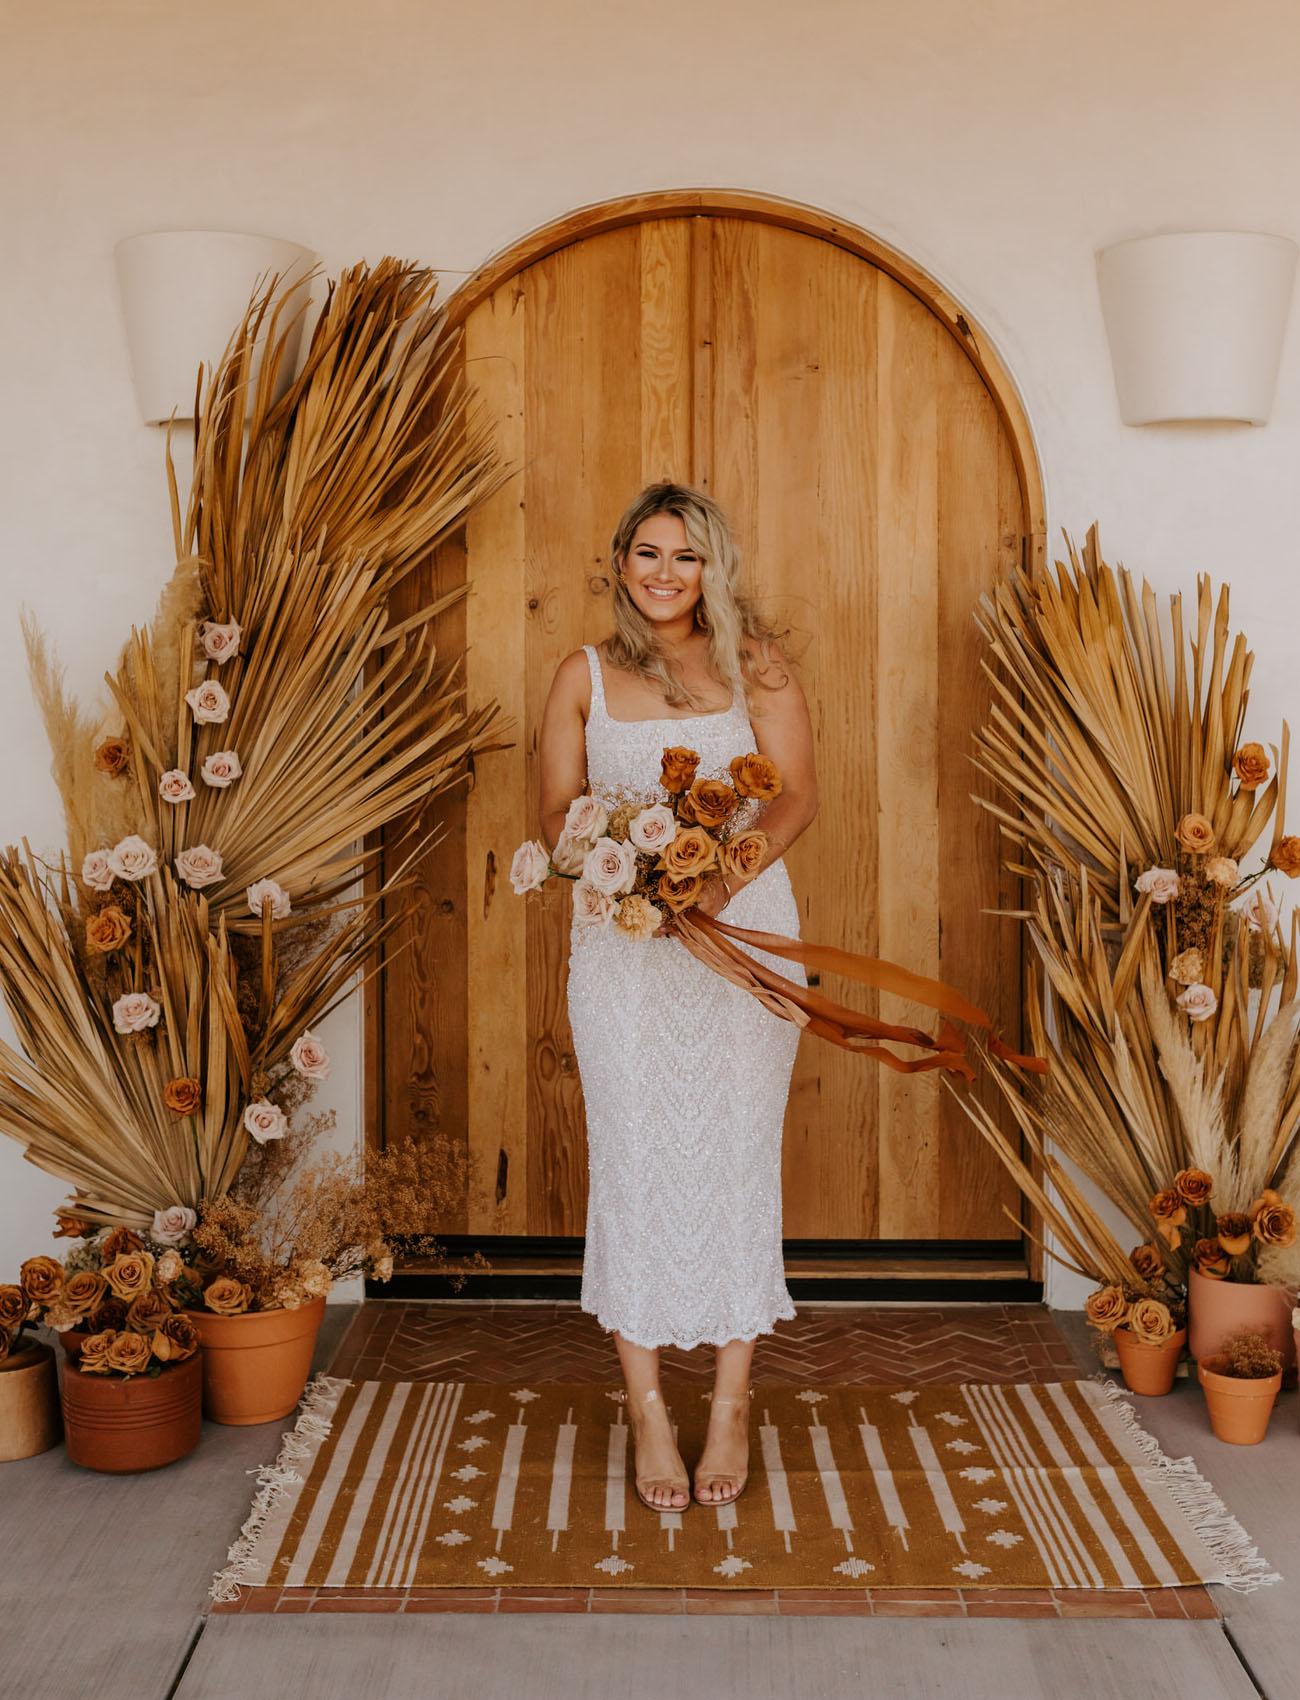 Bruid in een bohemian trouwjurk met bruidsboeket